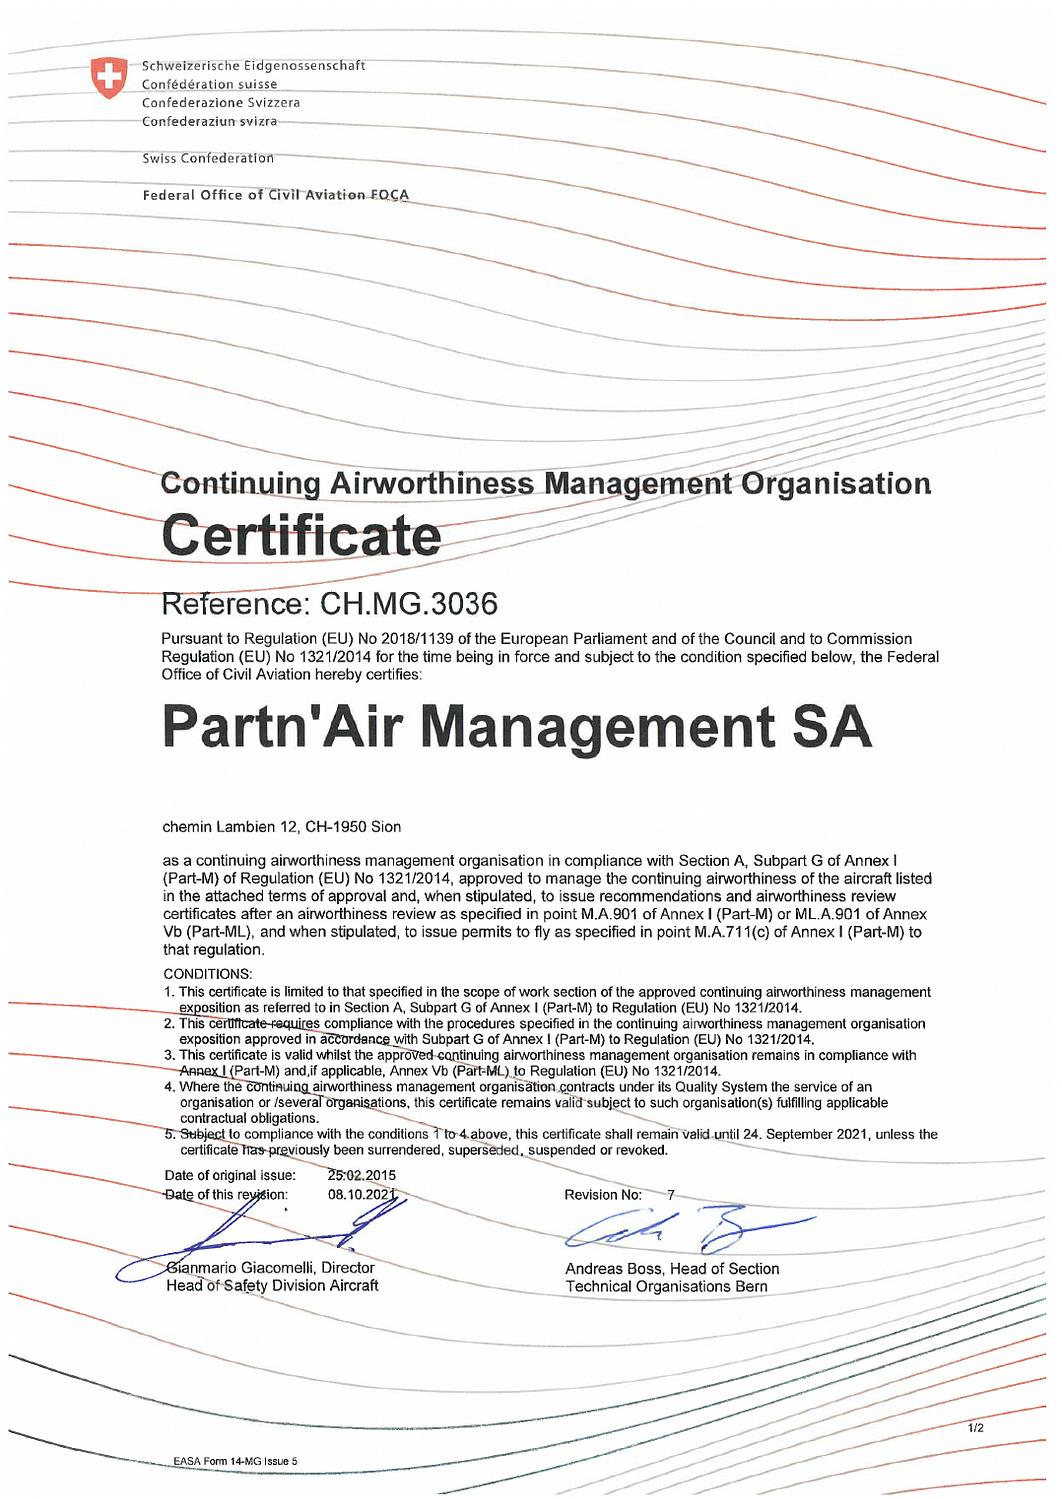 CAMO Certificate - Partn'Air